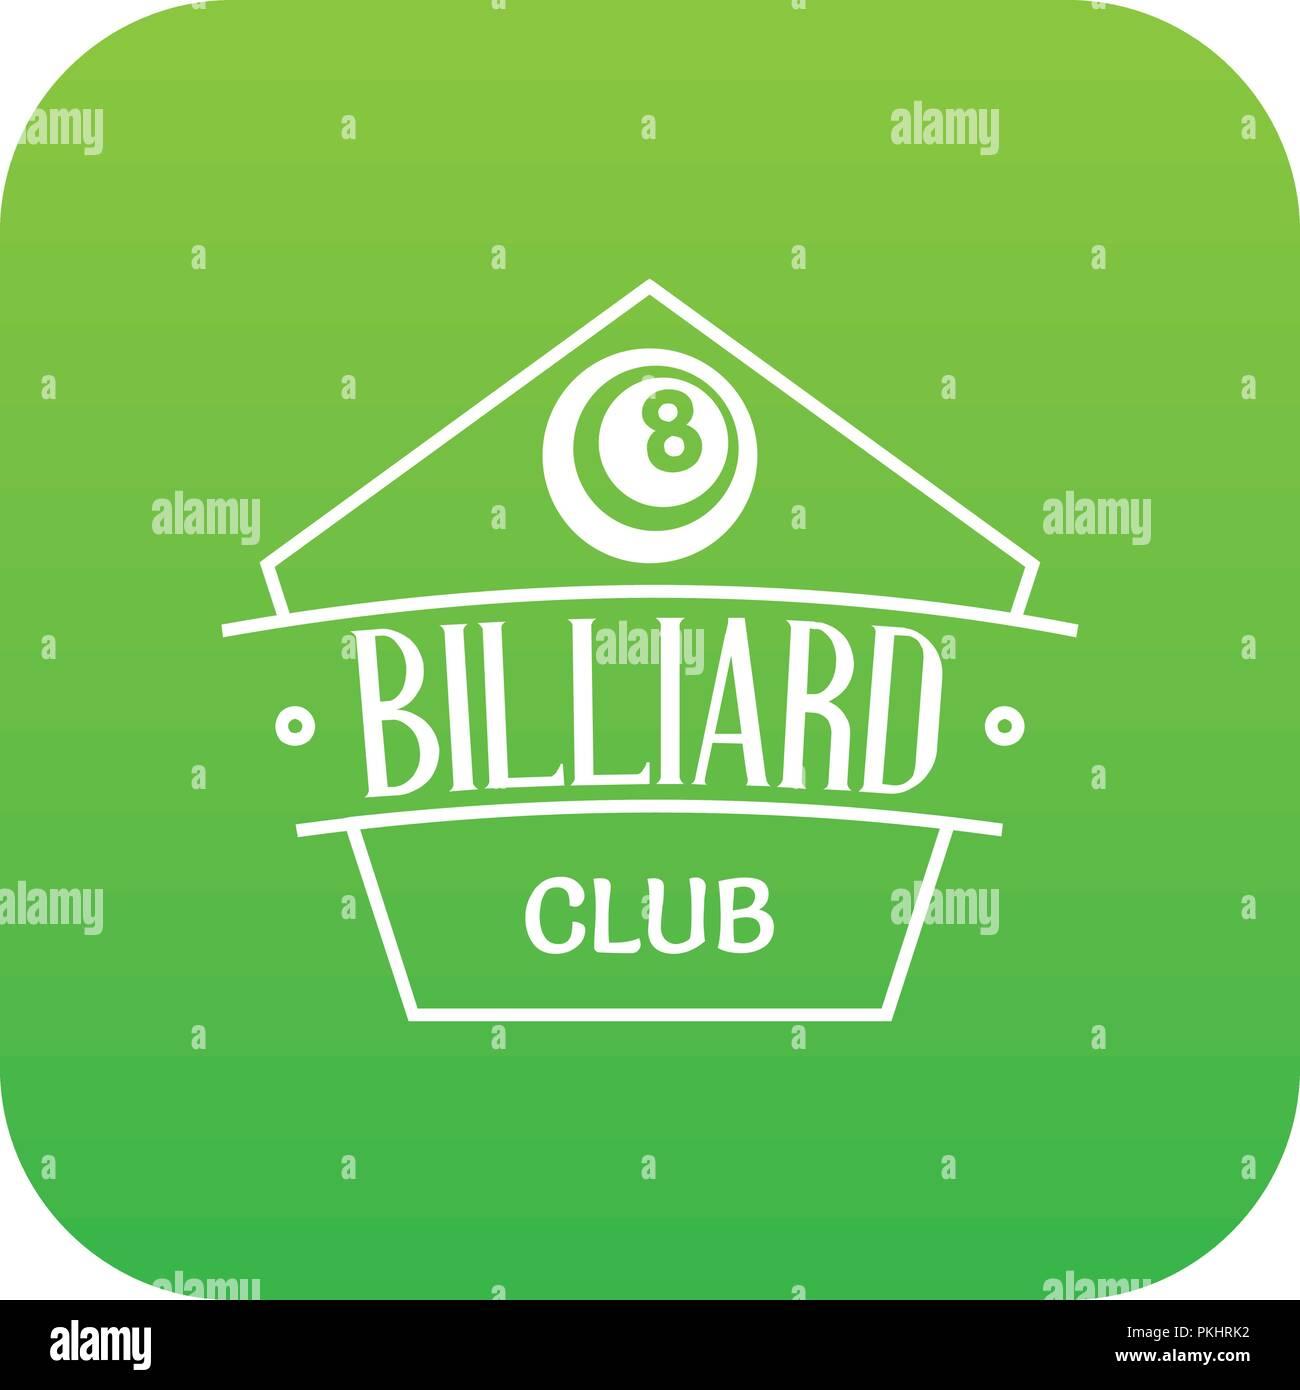 Billiard icon green vector - Stock Image